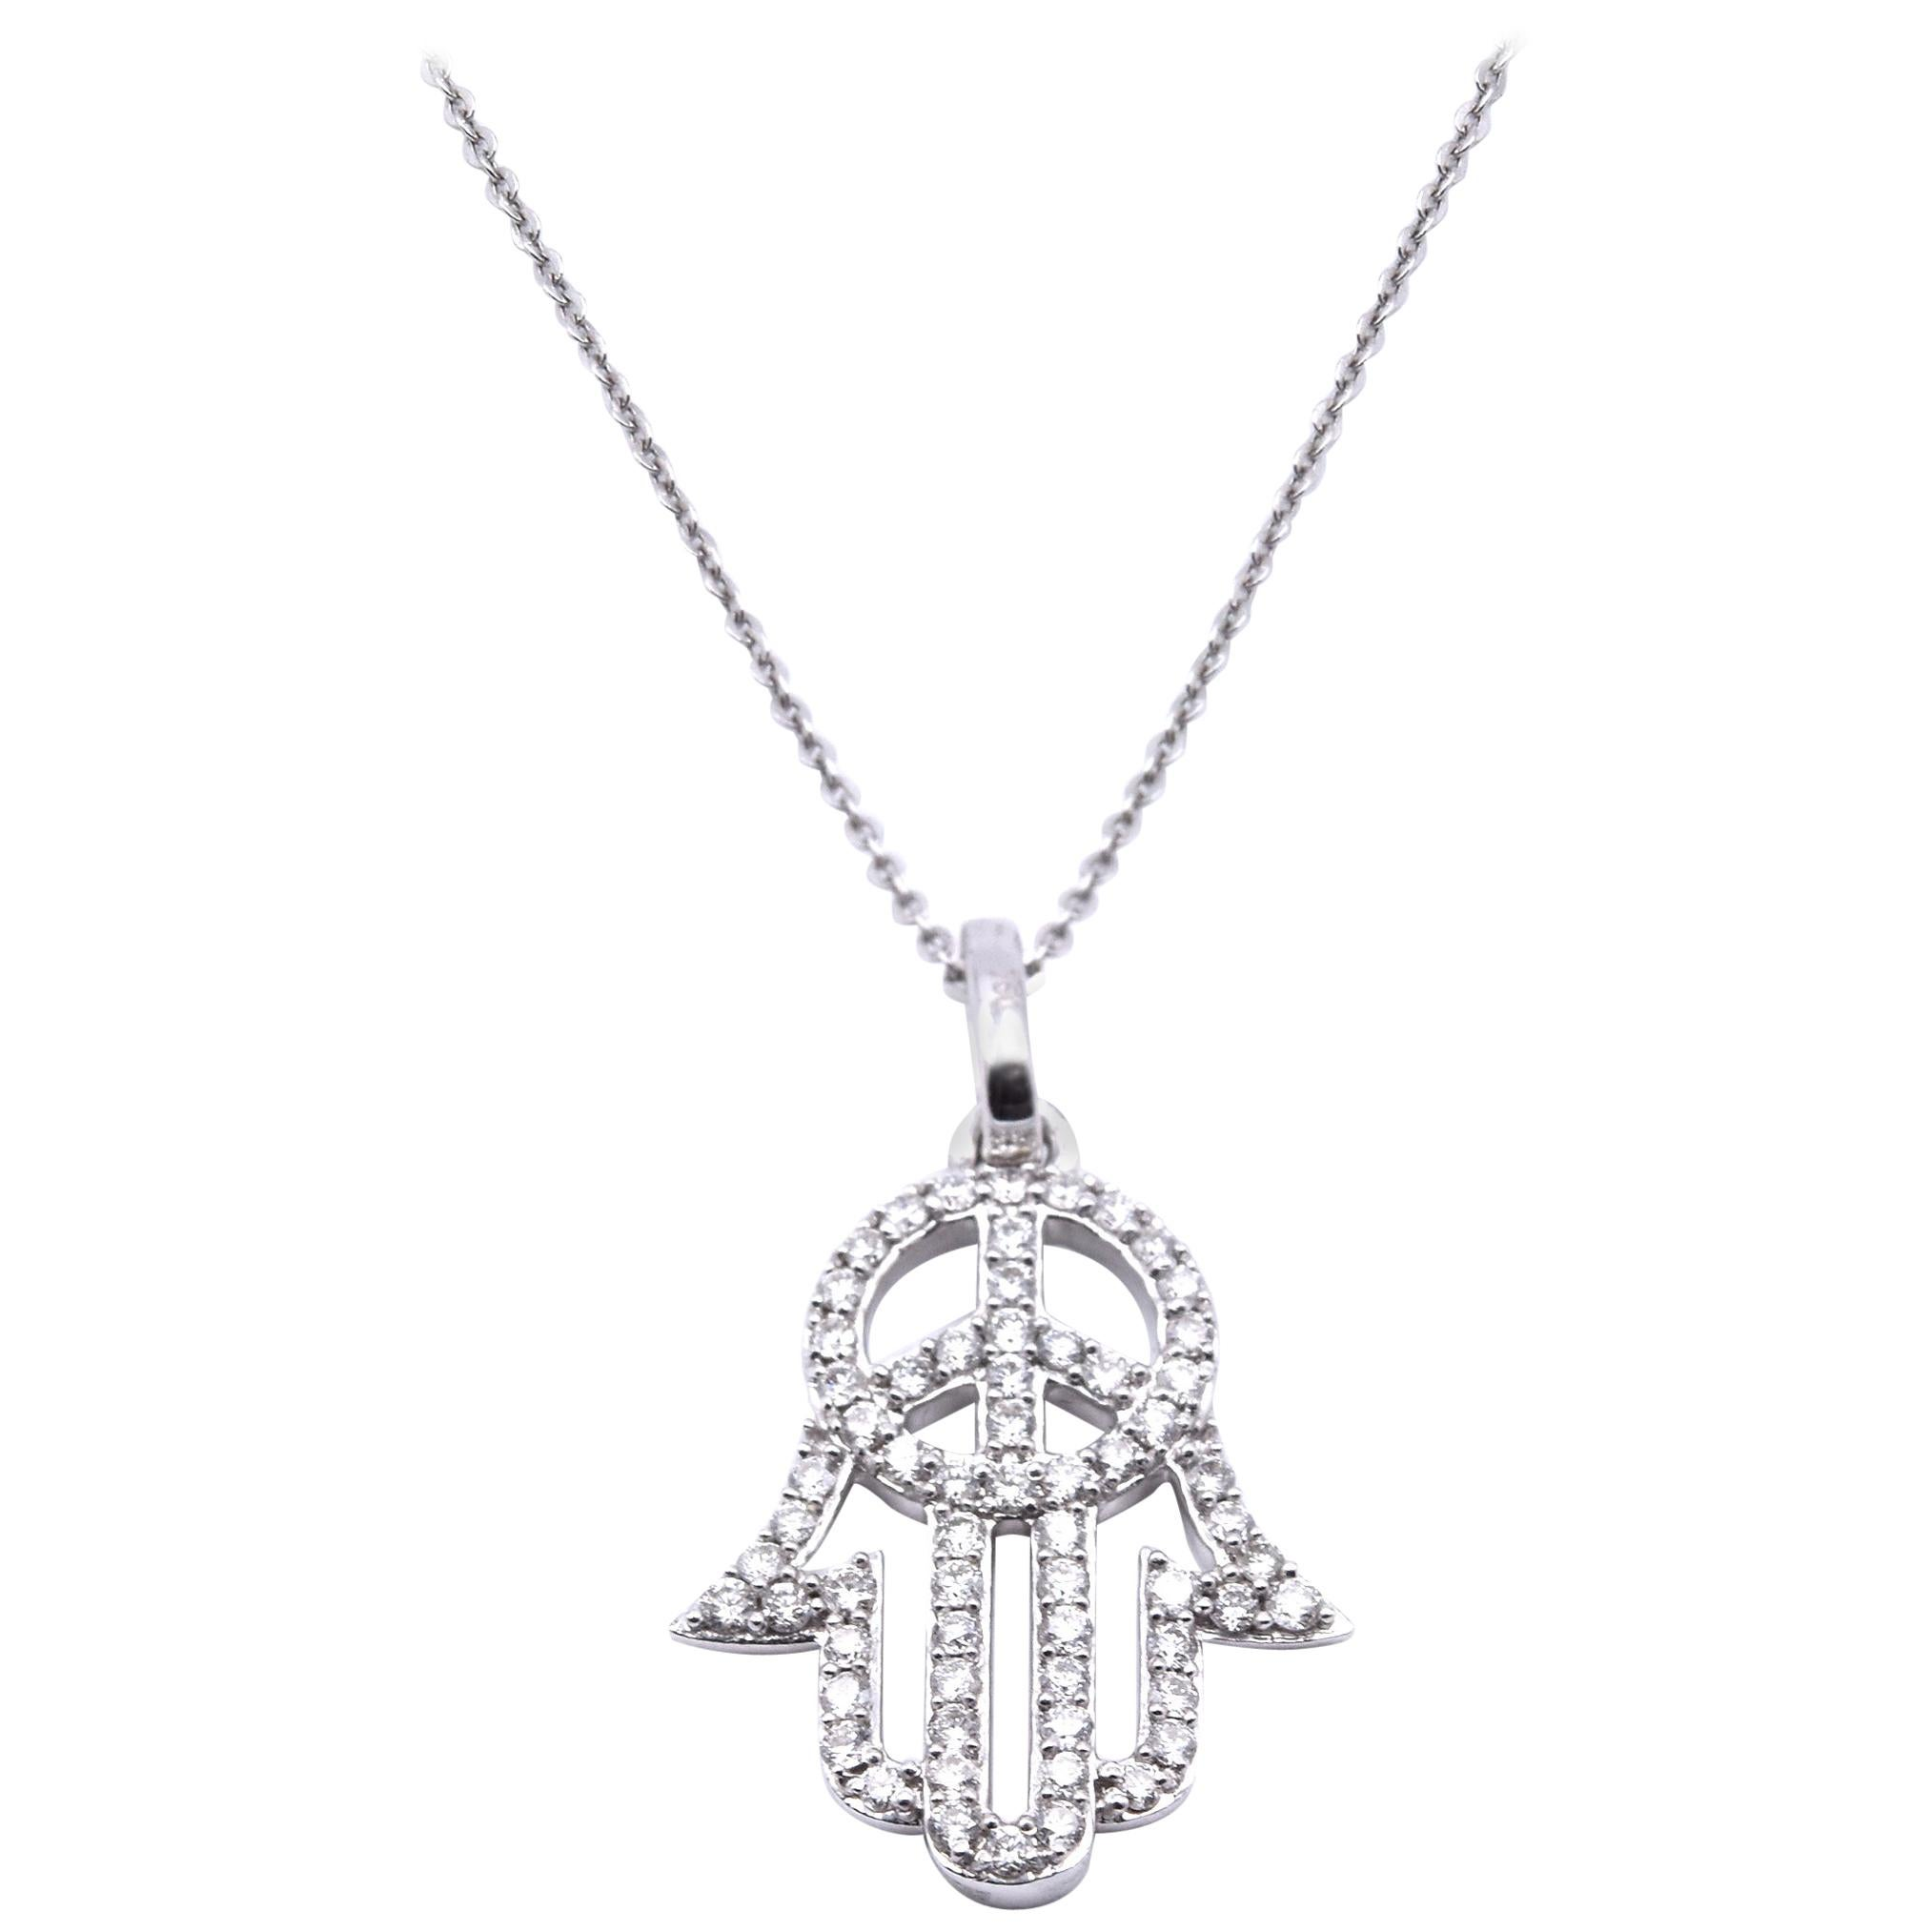 18 Karat White Gold Diamond Hamsa Peace Sign Necklace